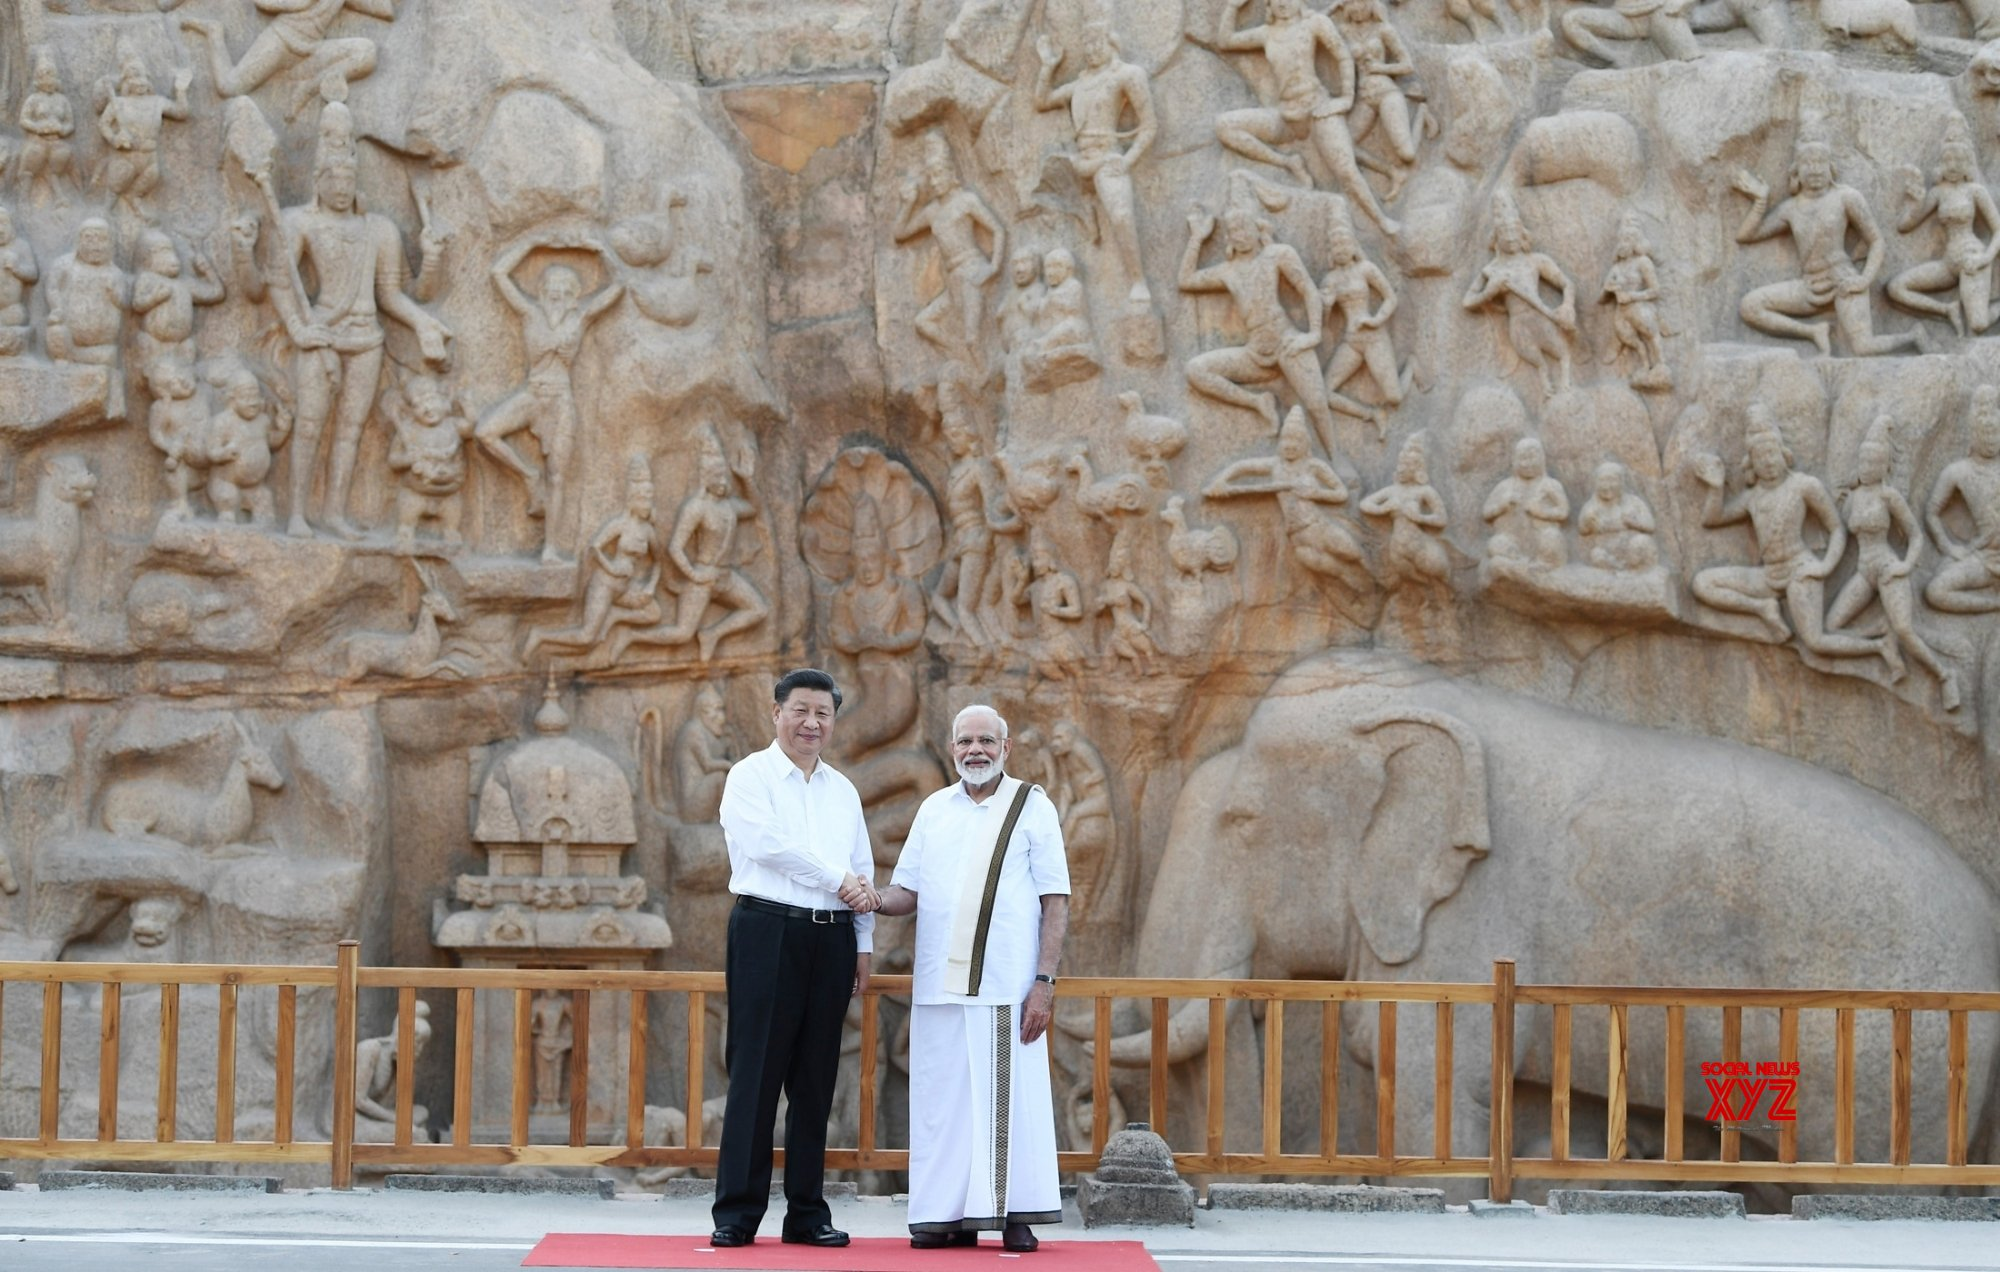 Mahabalipuram: PM Modi, Chinese President visit Pancha Rathas complex (Batch - 3) #Gallery